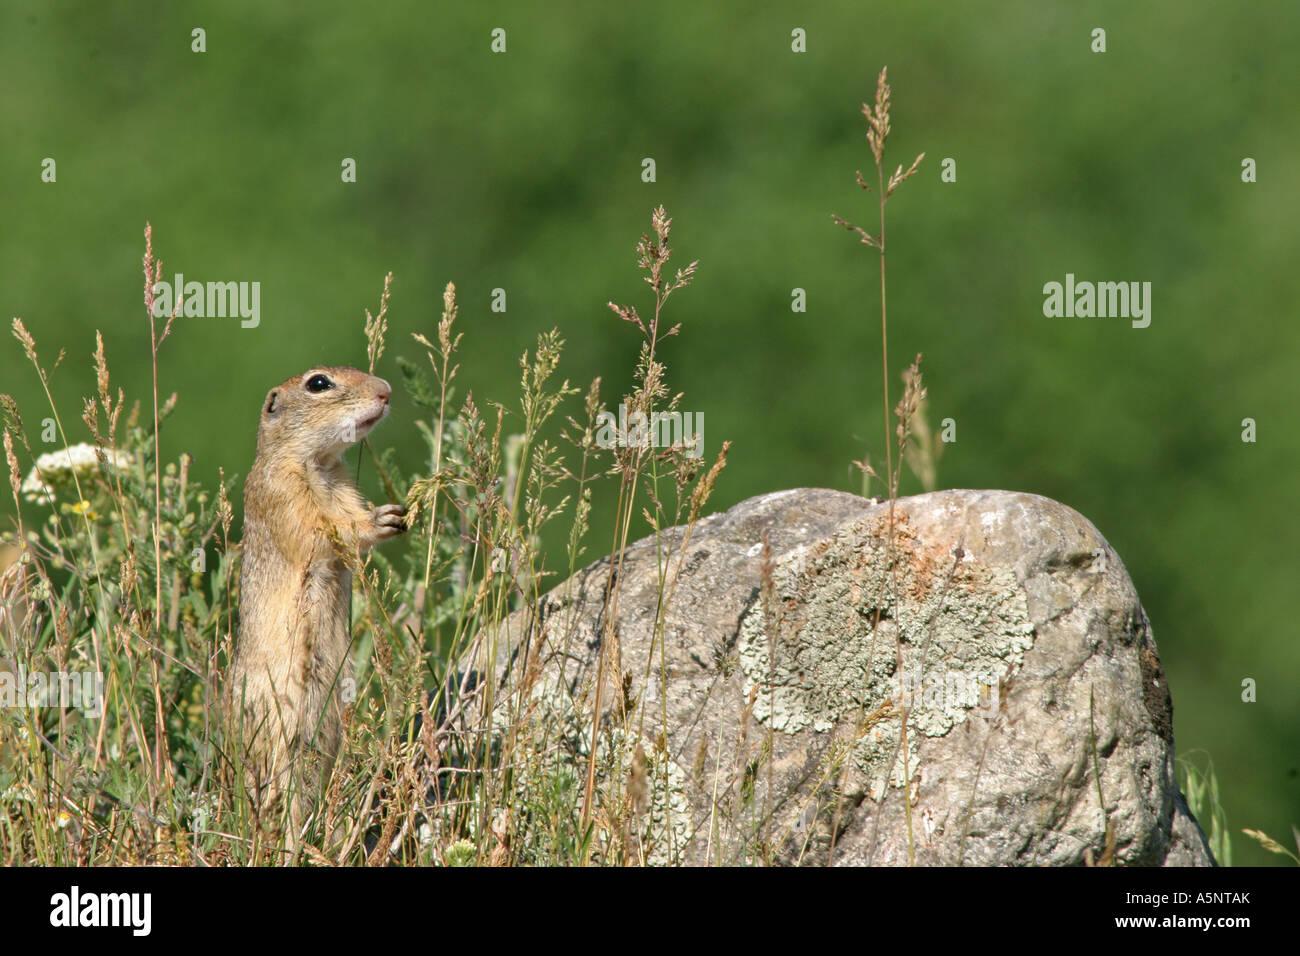 European ground squirrel European suslik European souslik Citellus citellus Spermophilus citellus Stock Photo